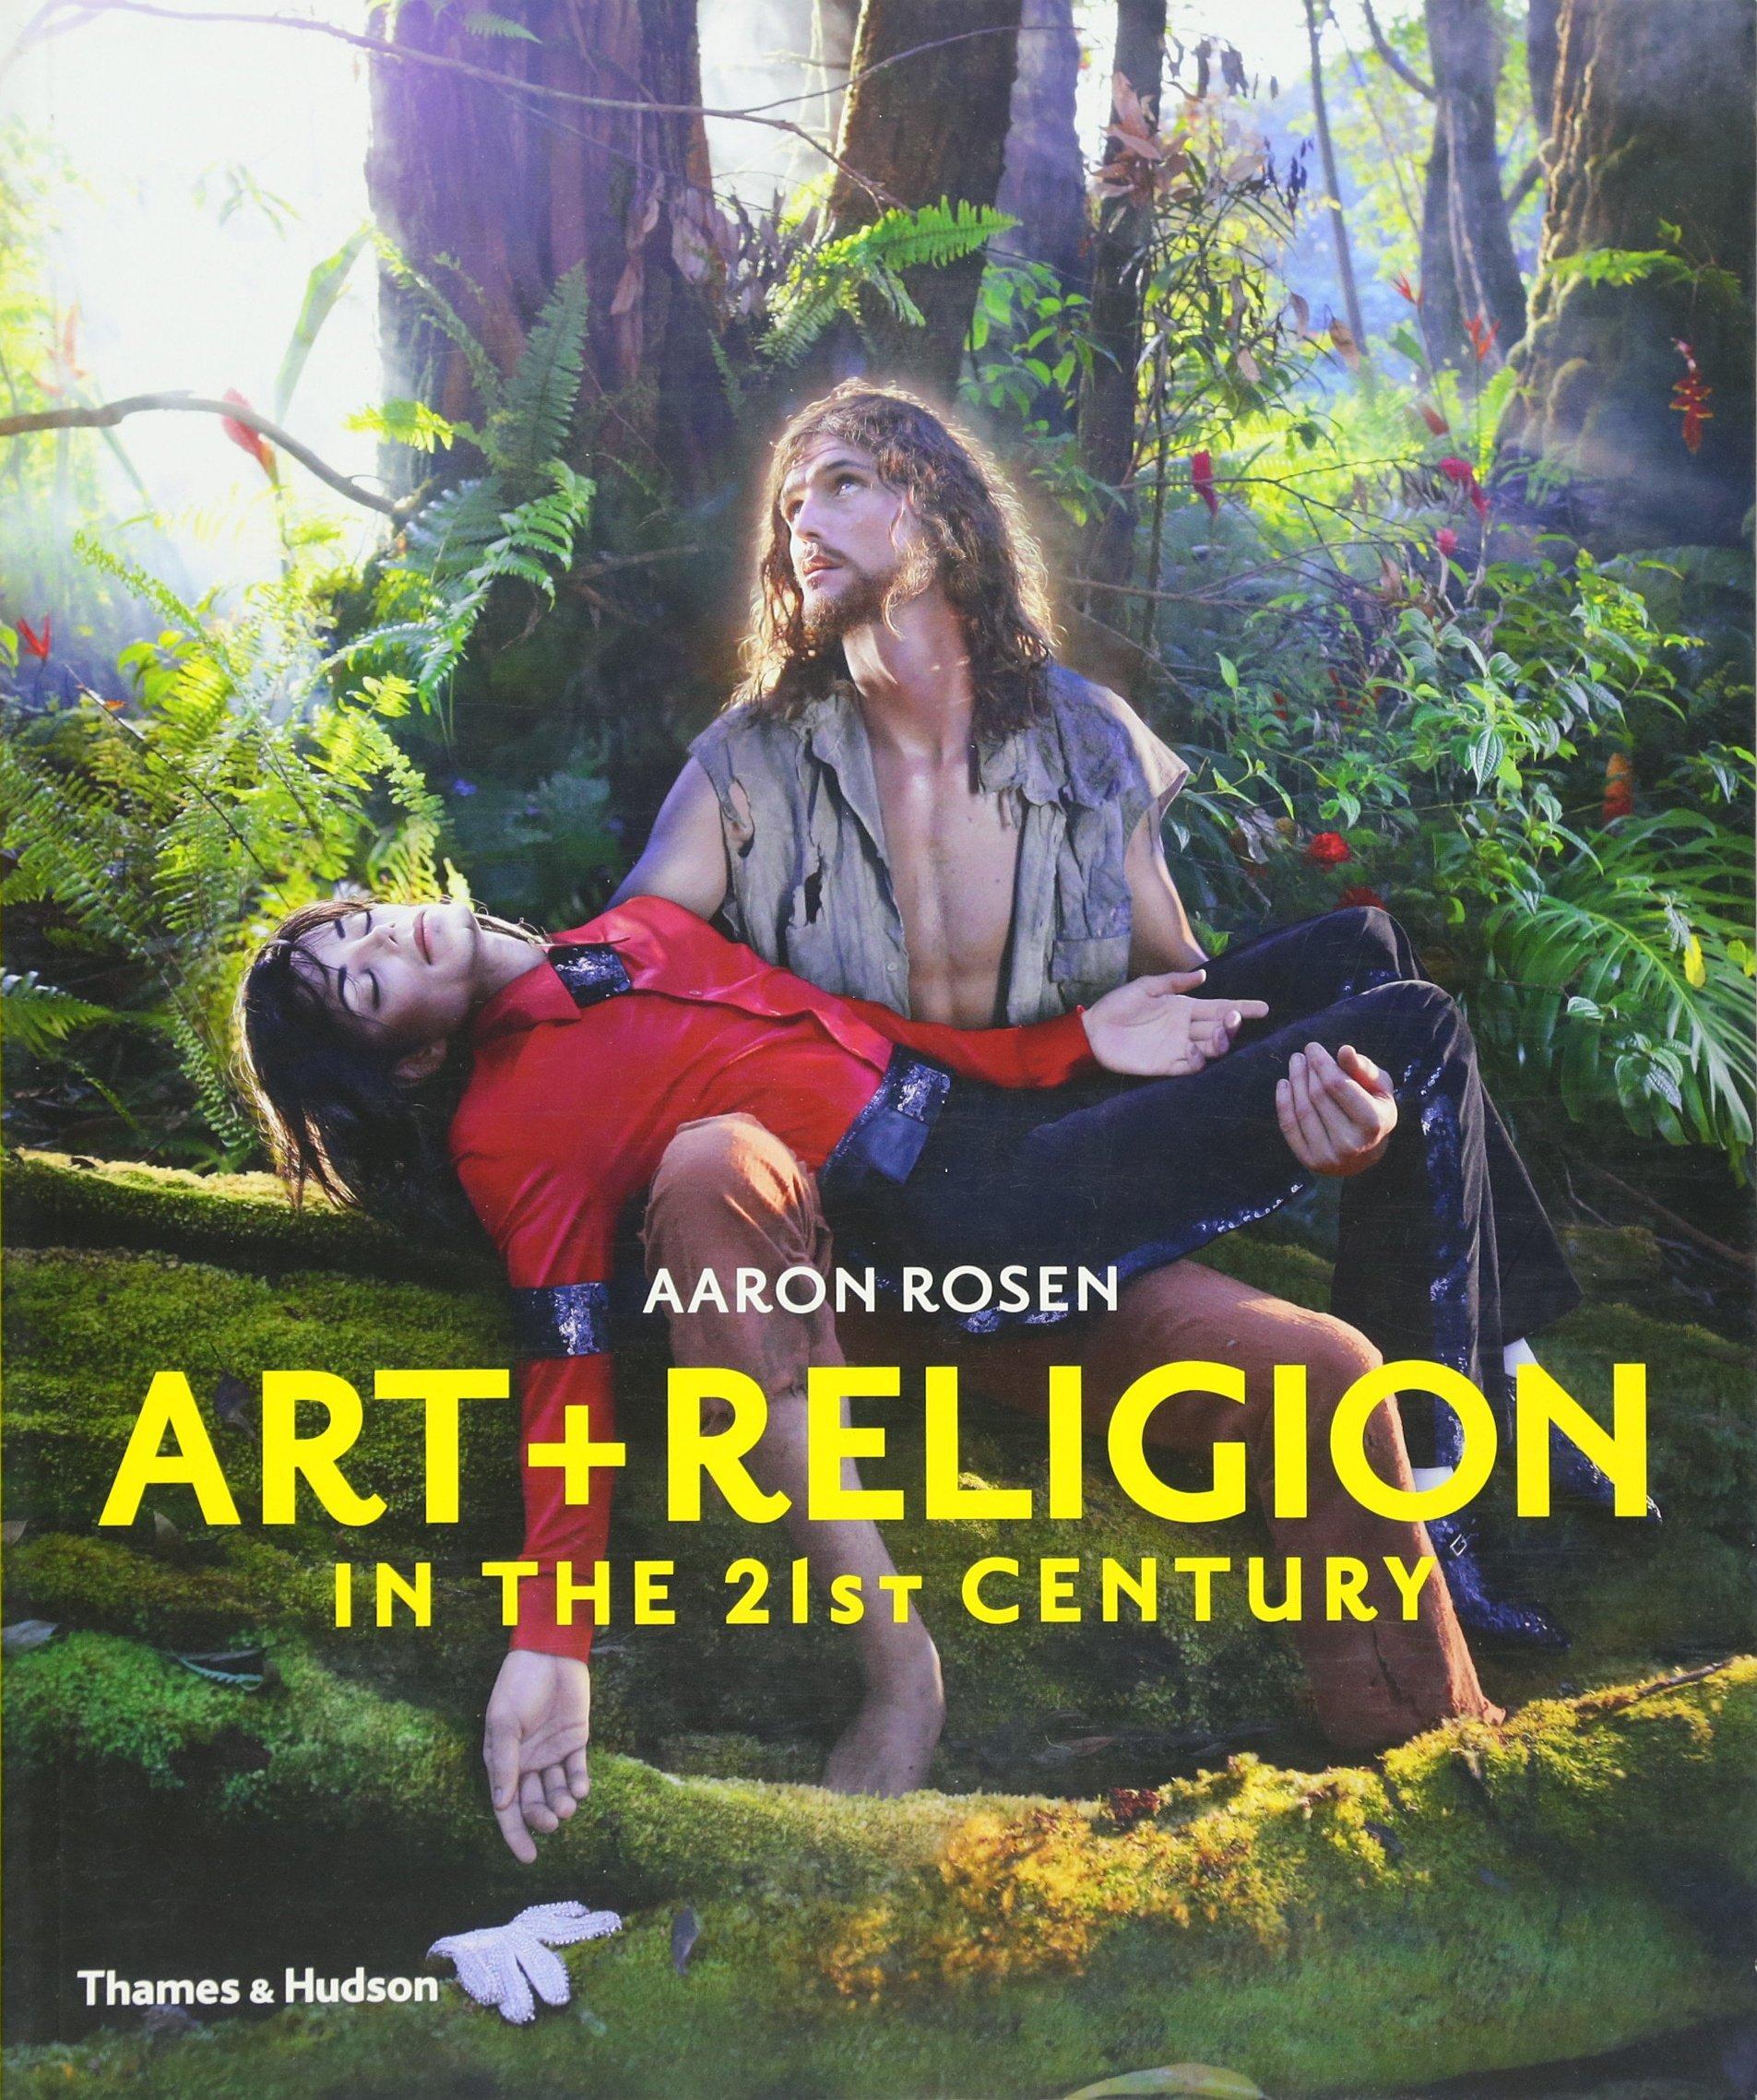 Art + Religion in the 21st Century (Anglais) Broché – 14 janvier 2017 Aaron Rosen Thames & Hudson Ltd 0500293031 Kunst